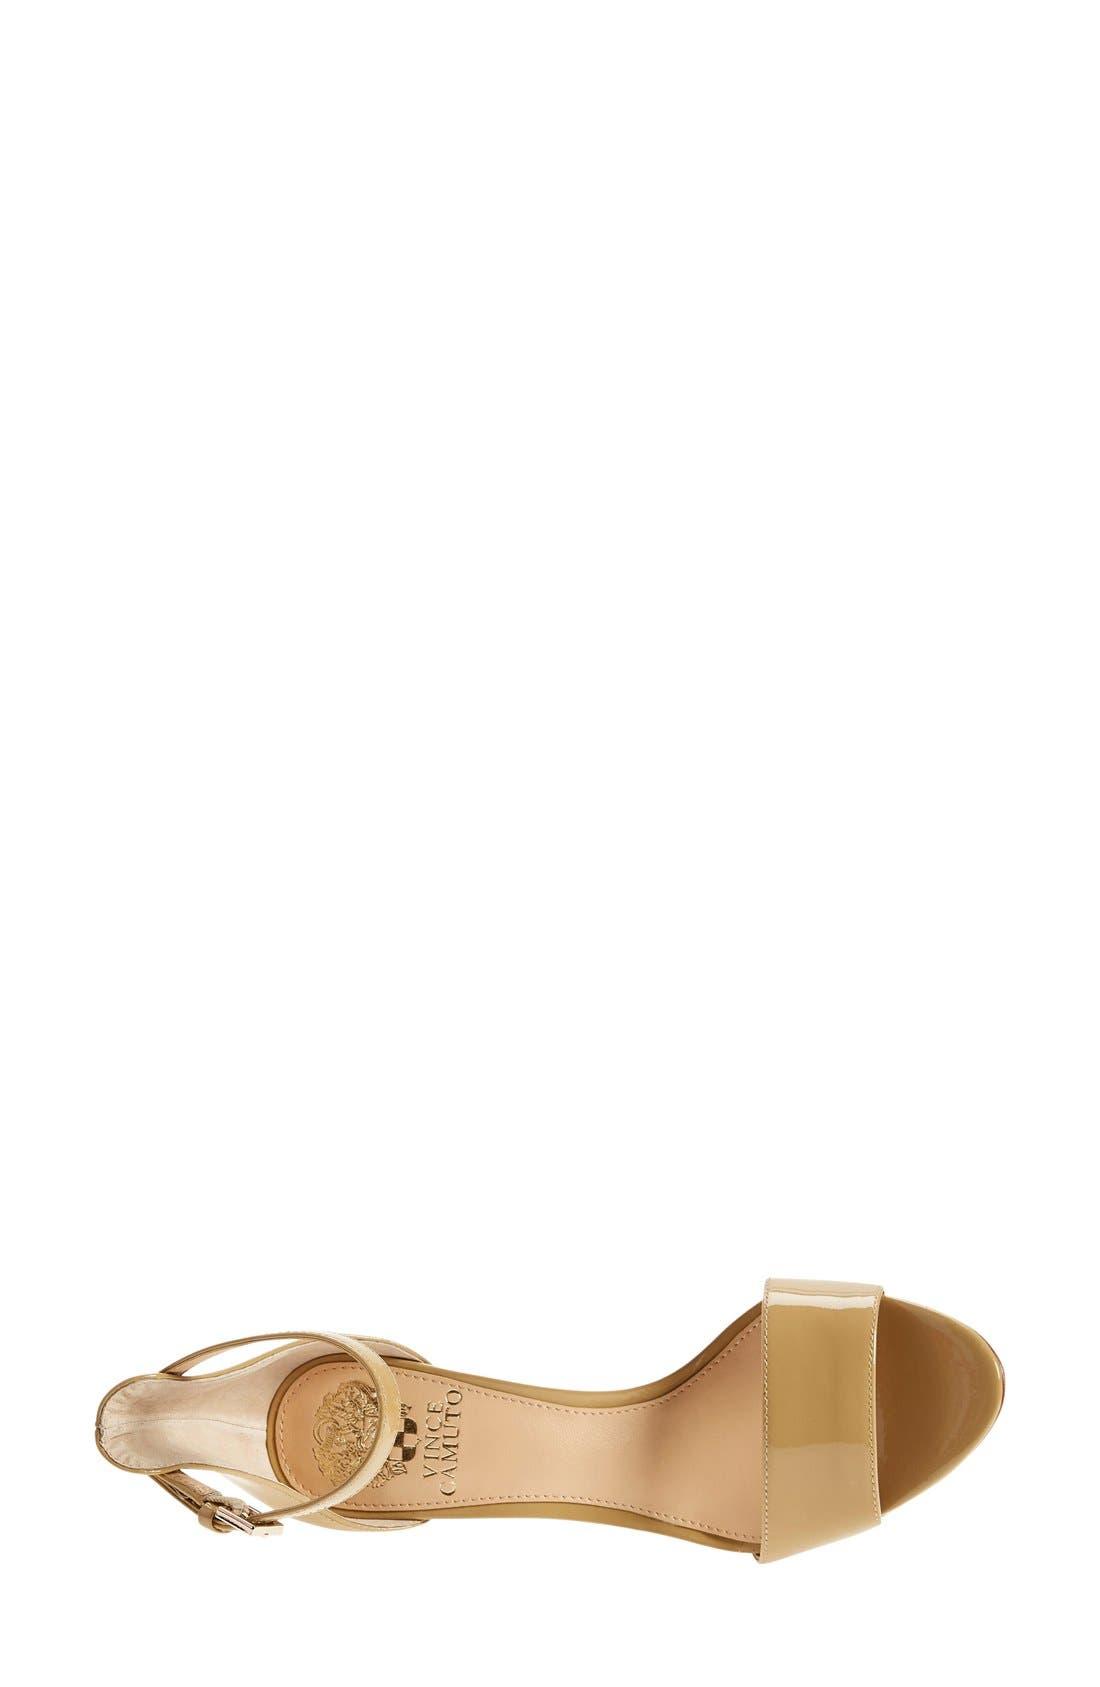 ,                             'Court' Ankle Strap Sandal,                             Alternate thumbnail 56, color,                             250